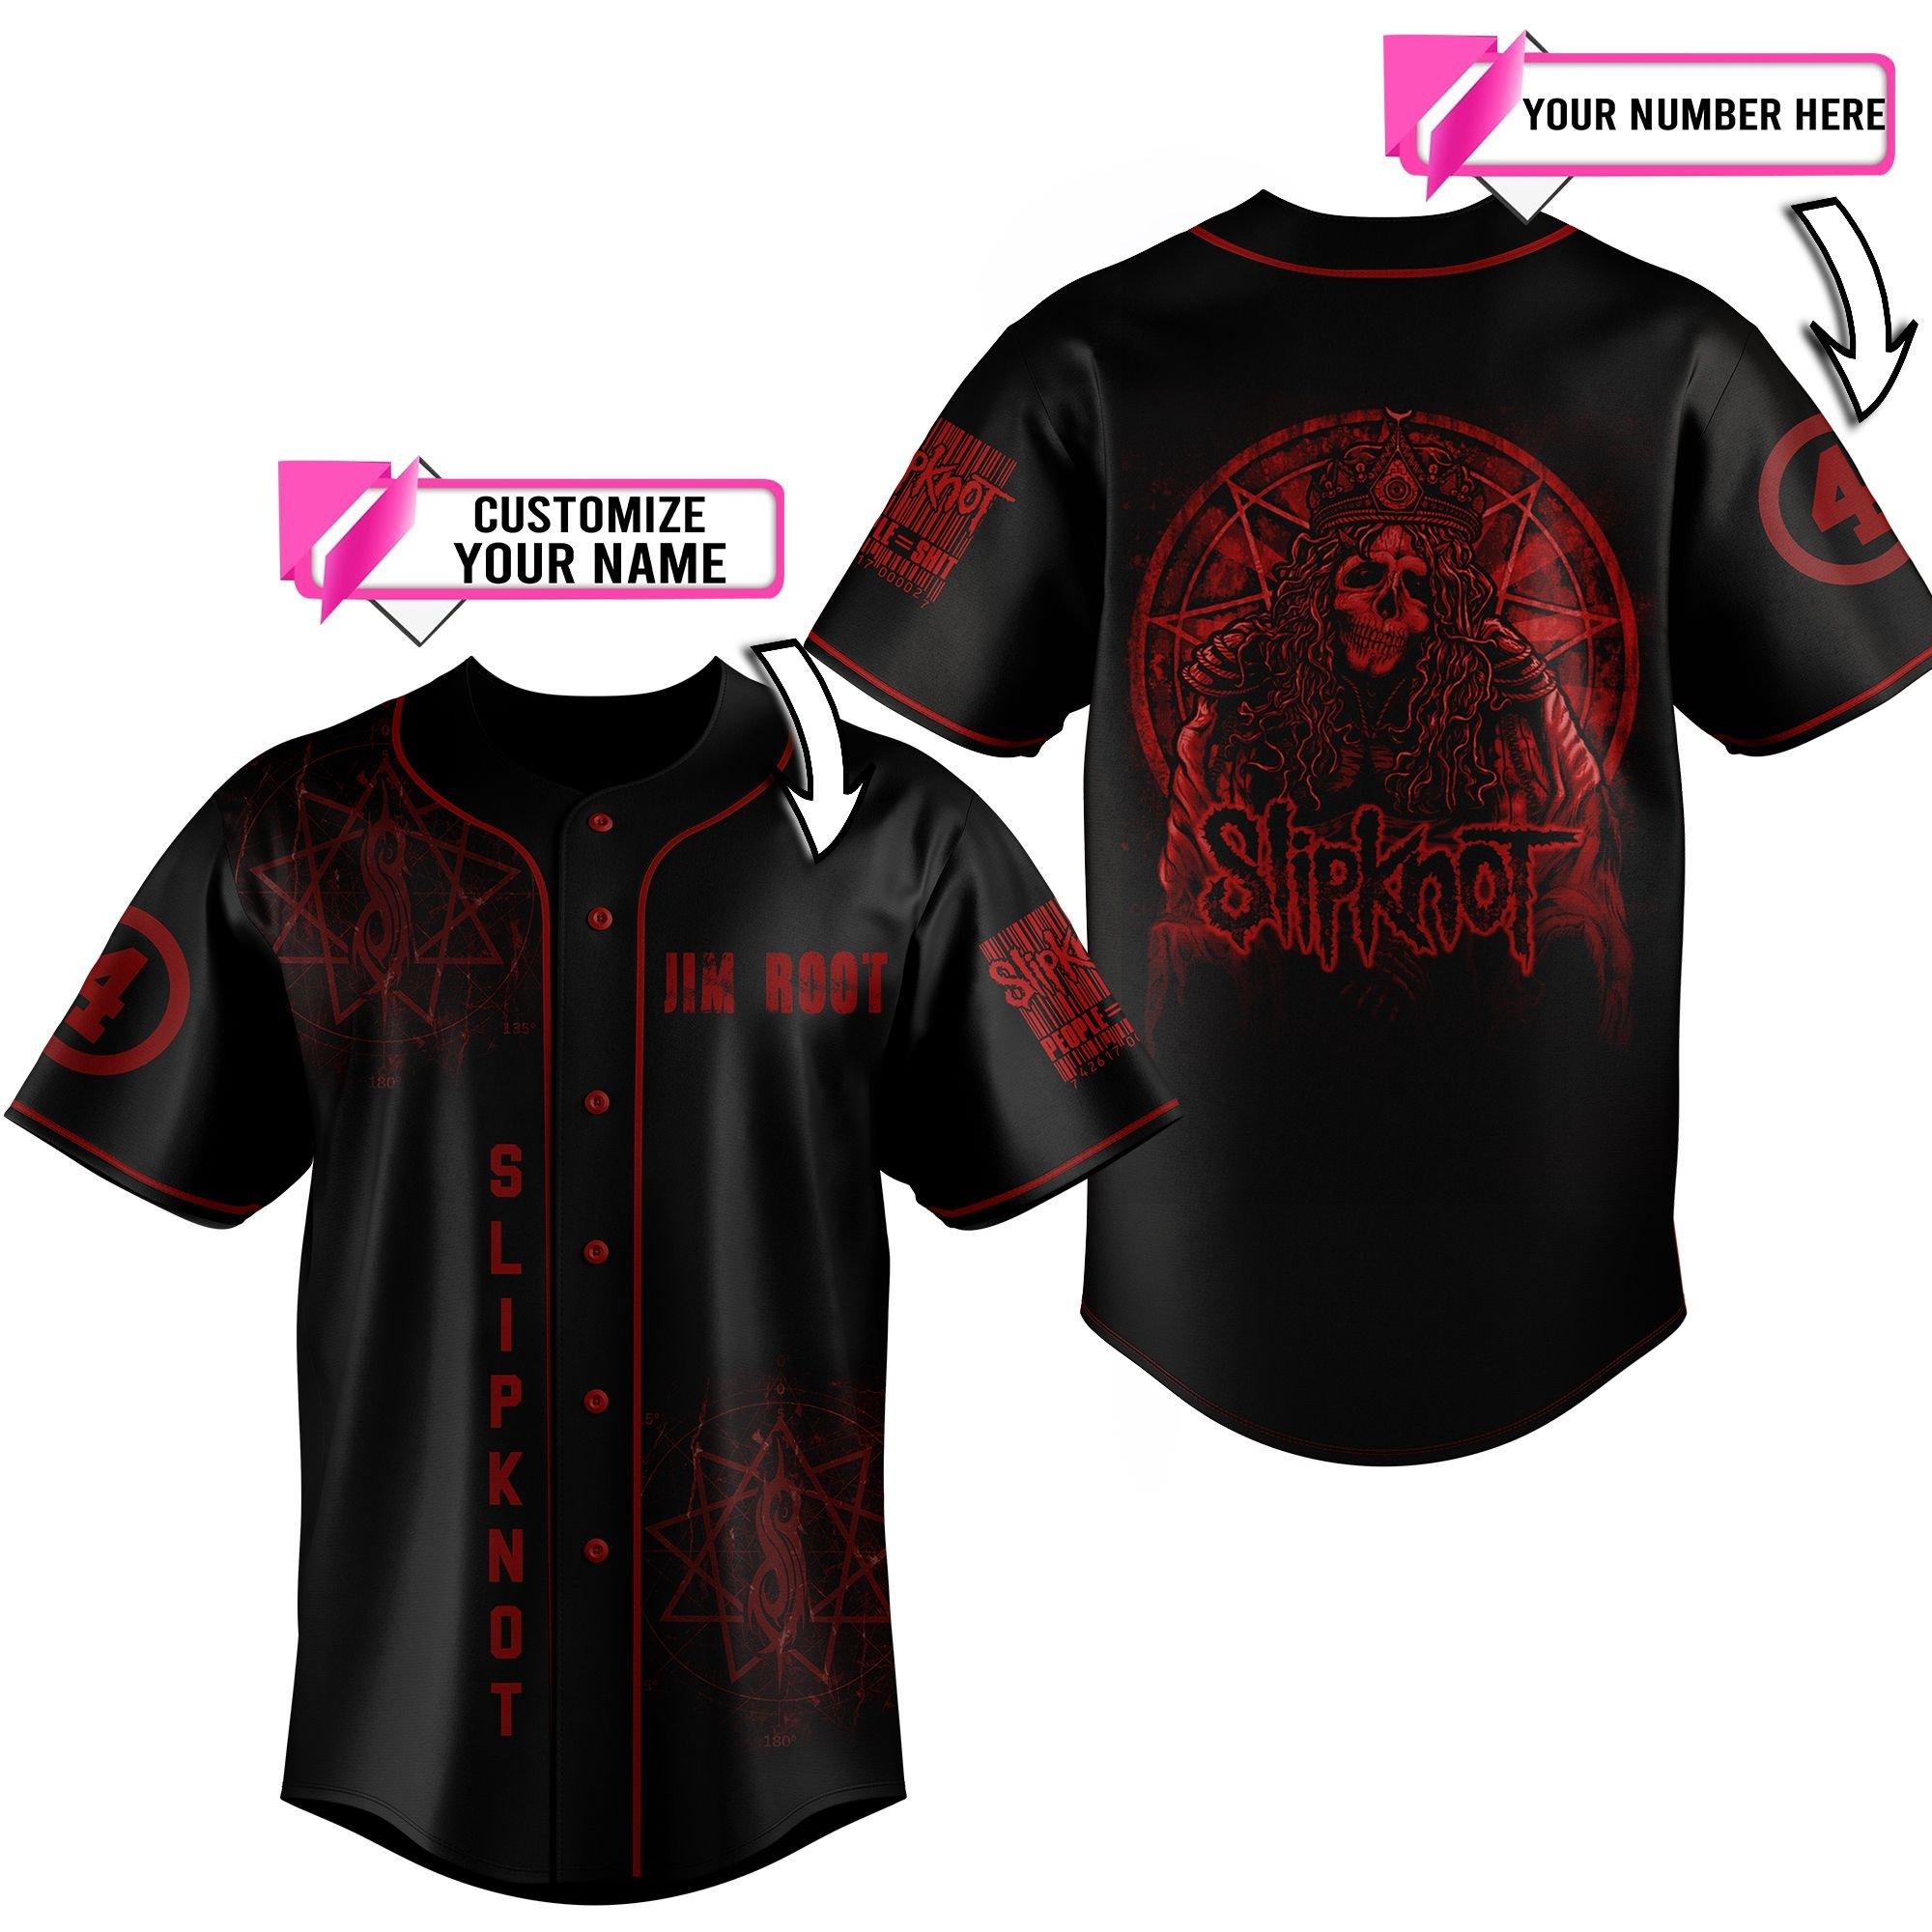 Personalized name Snipknot baseball jersey shirt